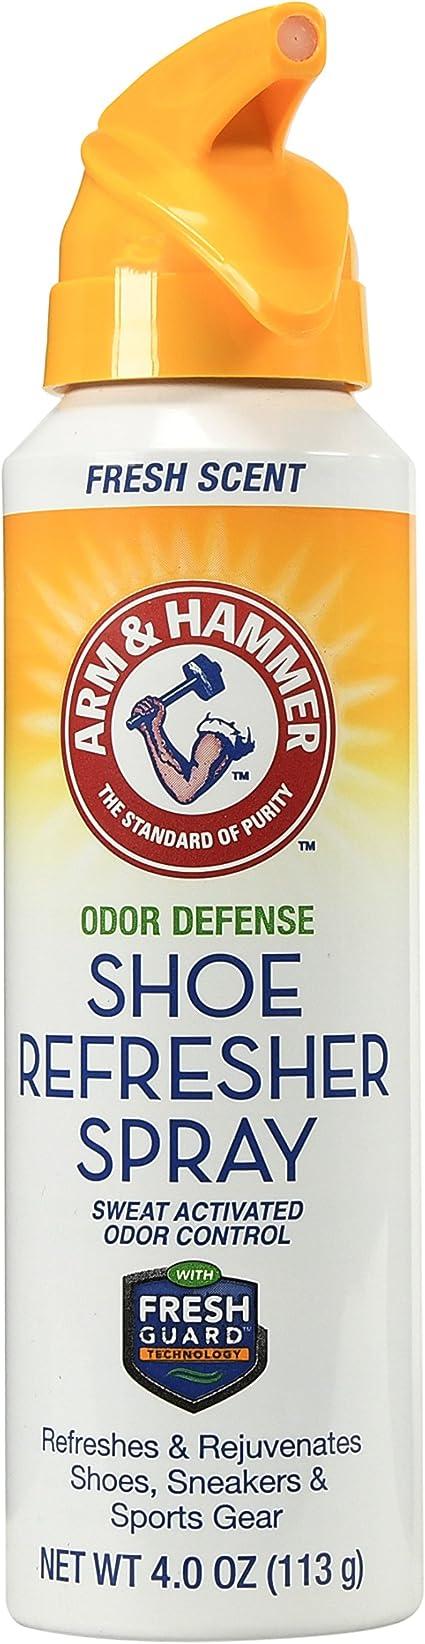 Arm & Hammer Odor Defense Shoe Refresher Spray, Fresh Scent, 4 oz